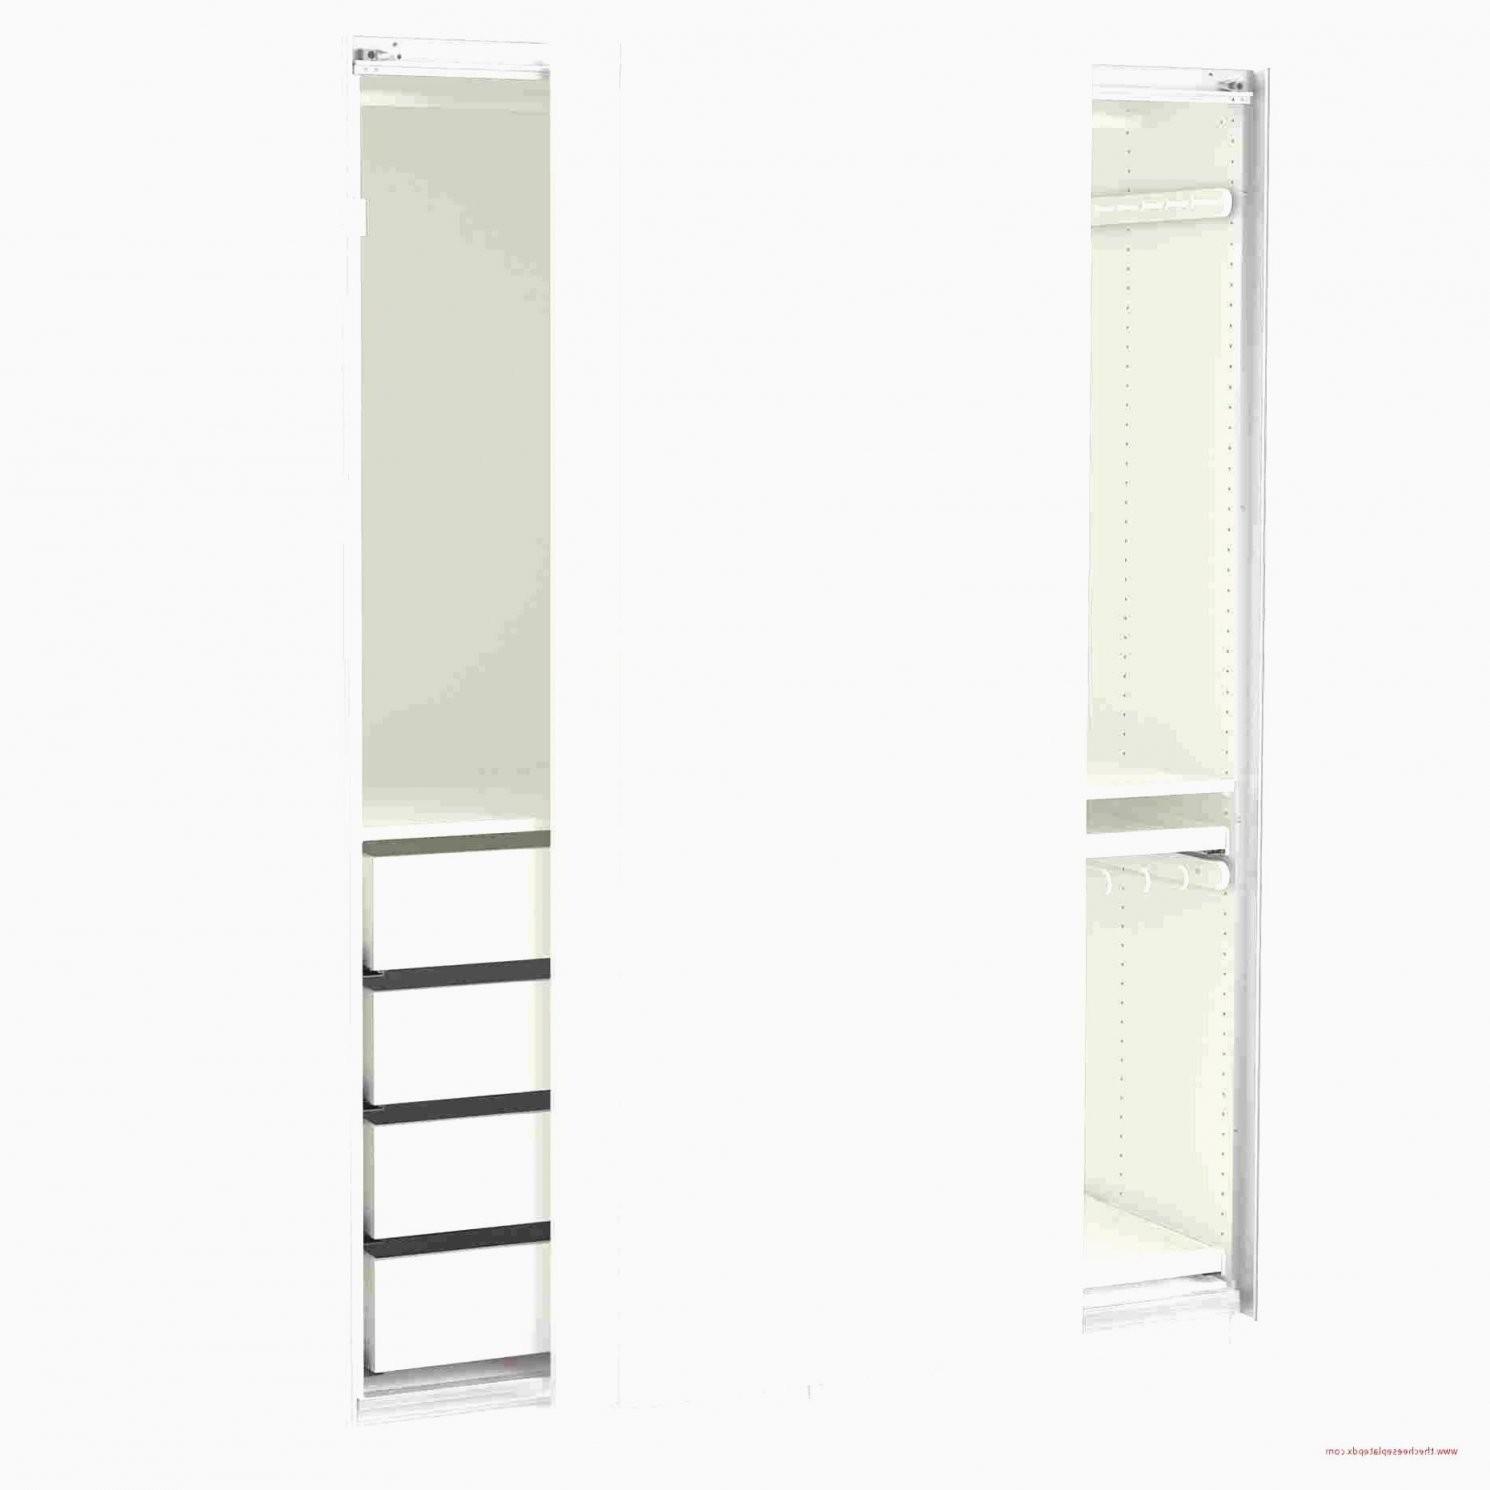 Schrank 50 Cm Breit Ikea Ikea Kleiderschrank 120 Cm Breit  Schrank von Apothekerschrank 40 Cm Breit Ikea Bild